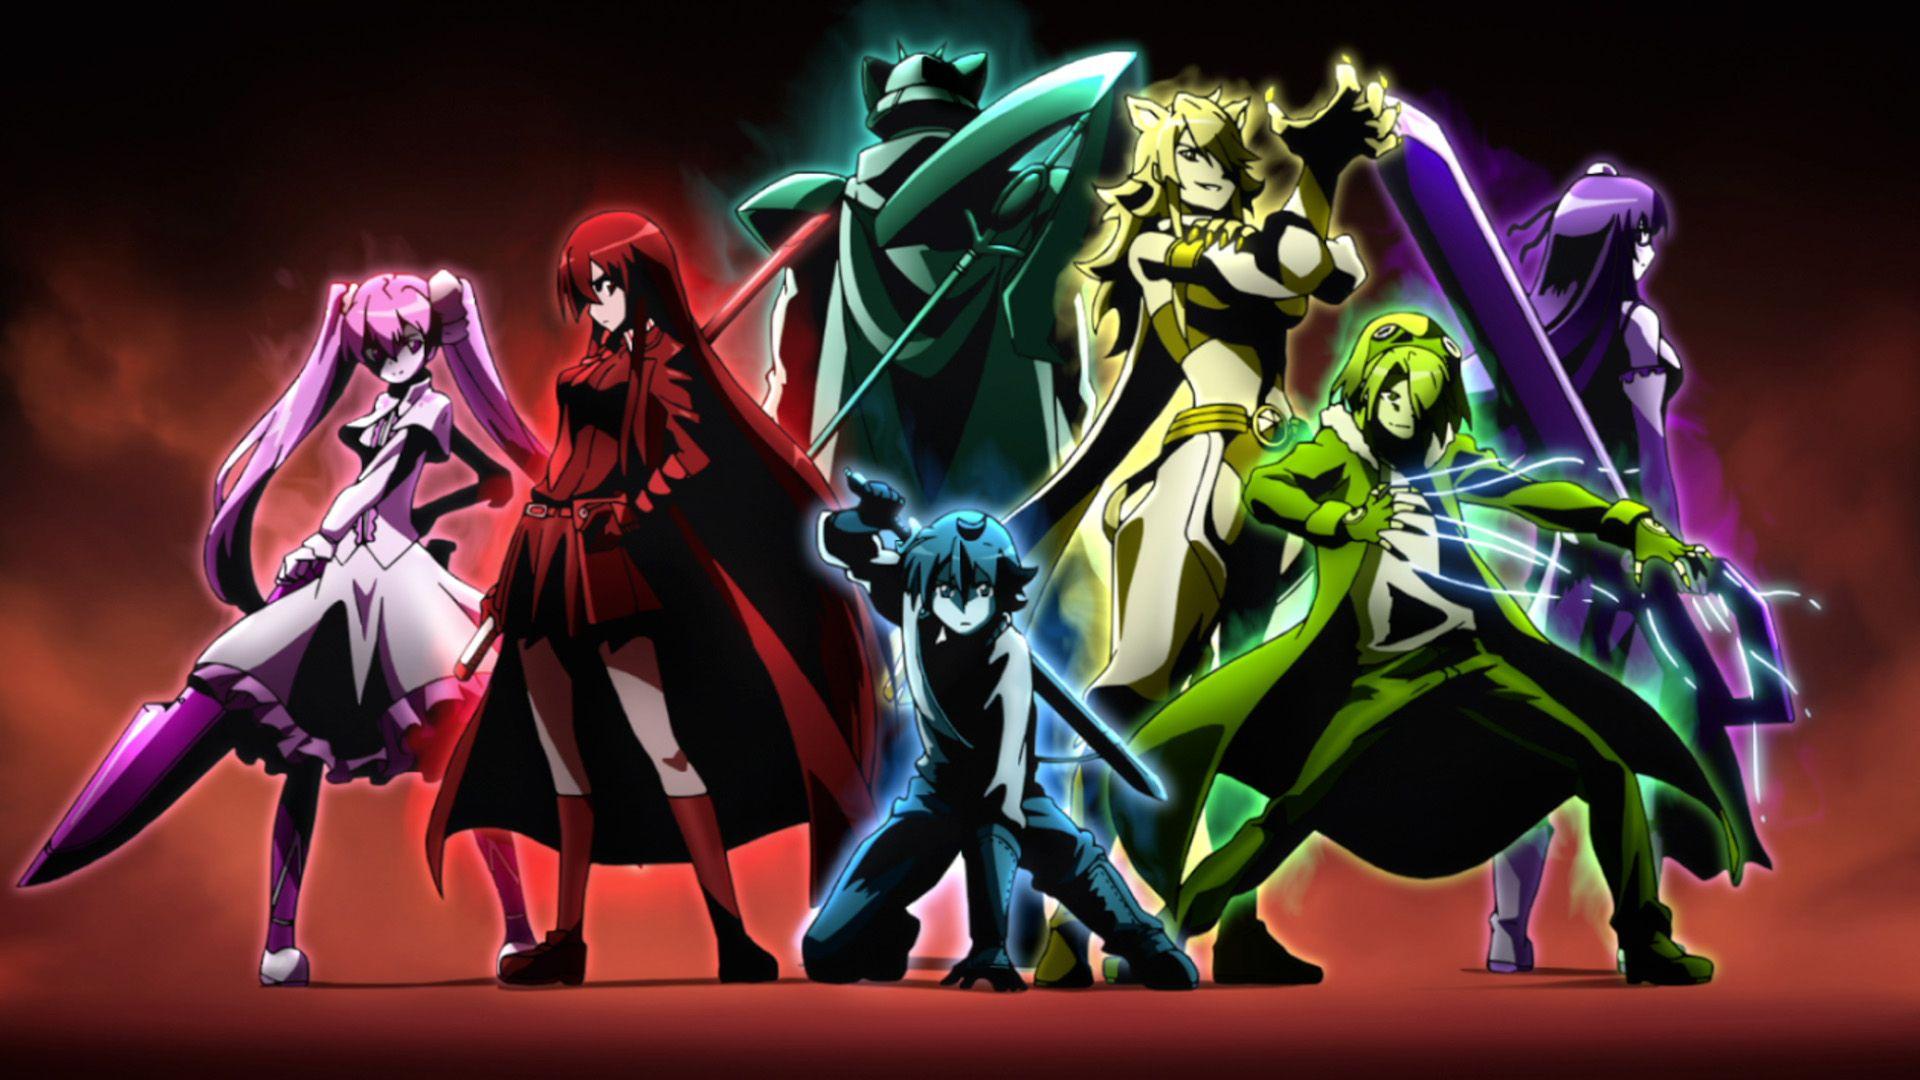 Red Eyes Sword Akame ga KILL! Épisode 1 Mort aux